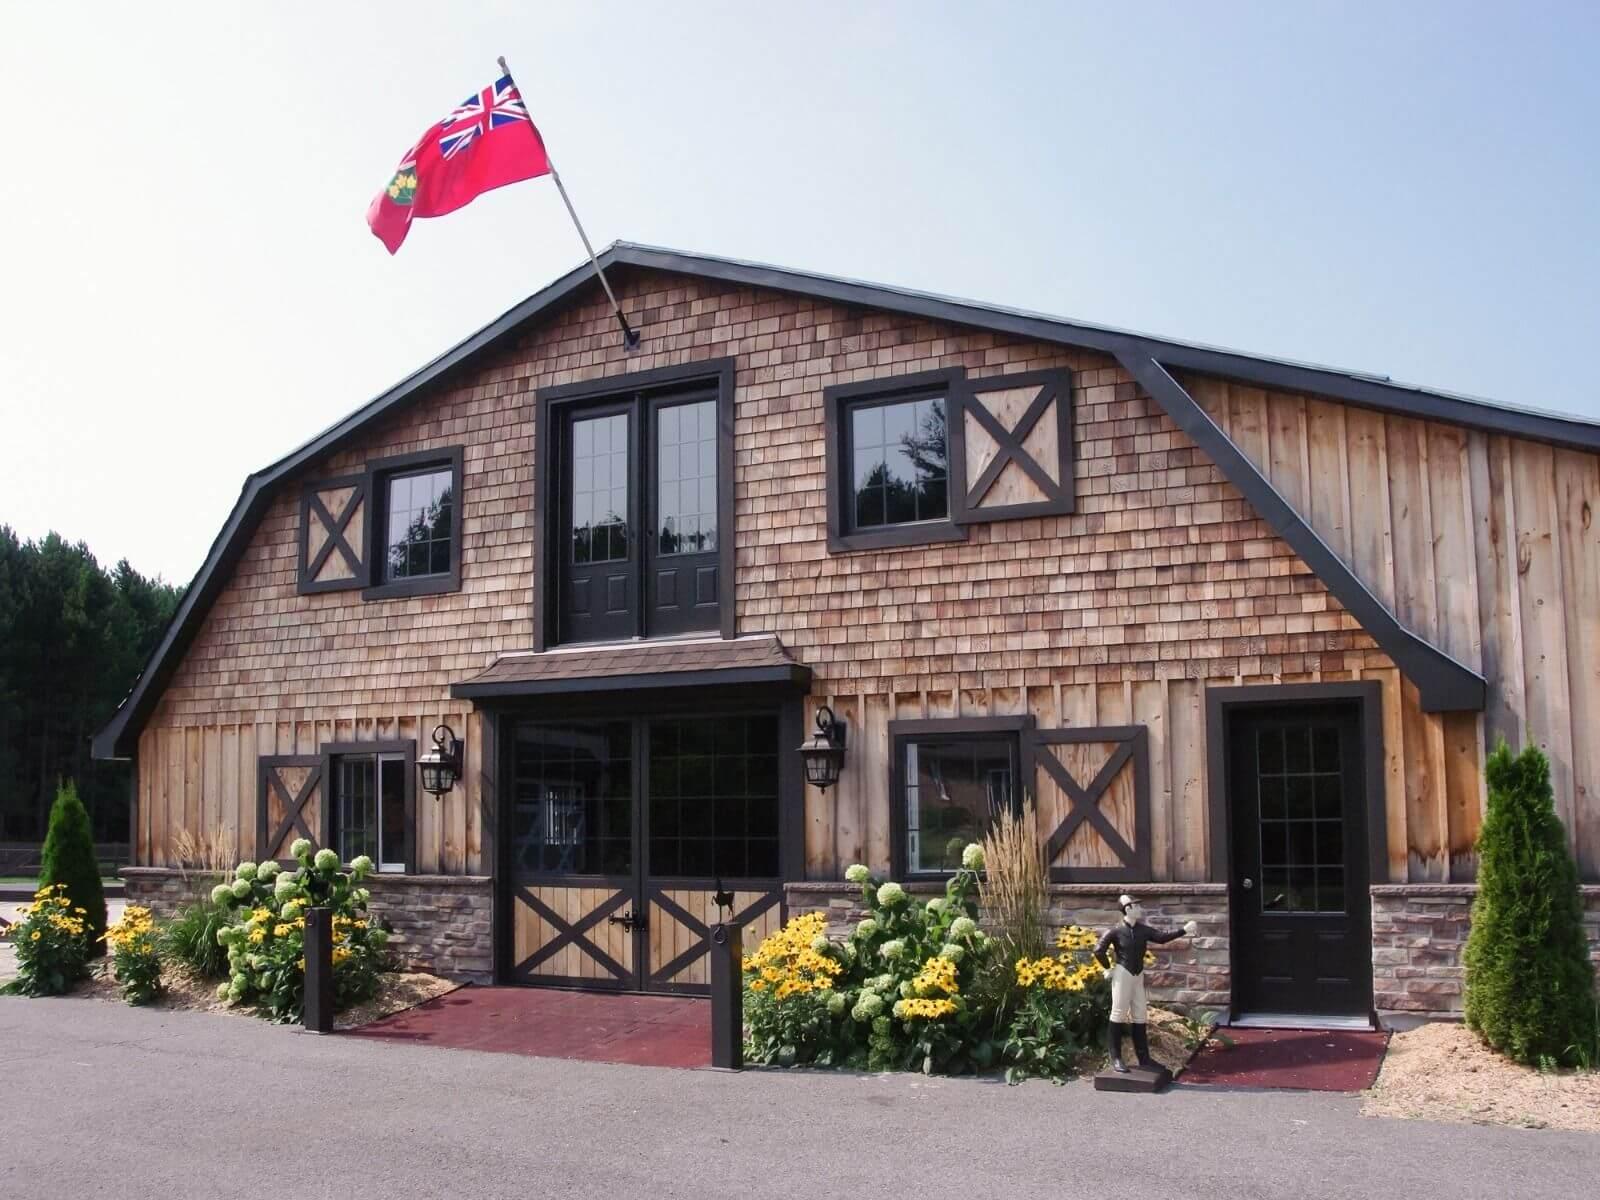 horse-barn-double-dutch-door-custom-grey-wood-windows